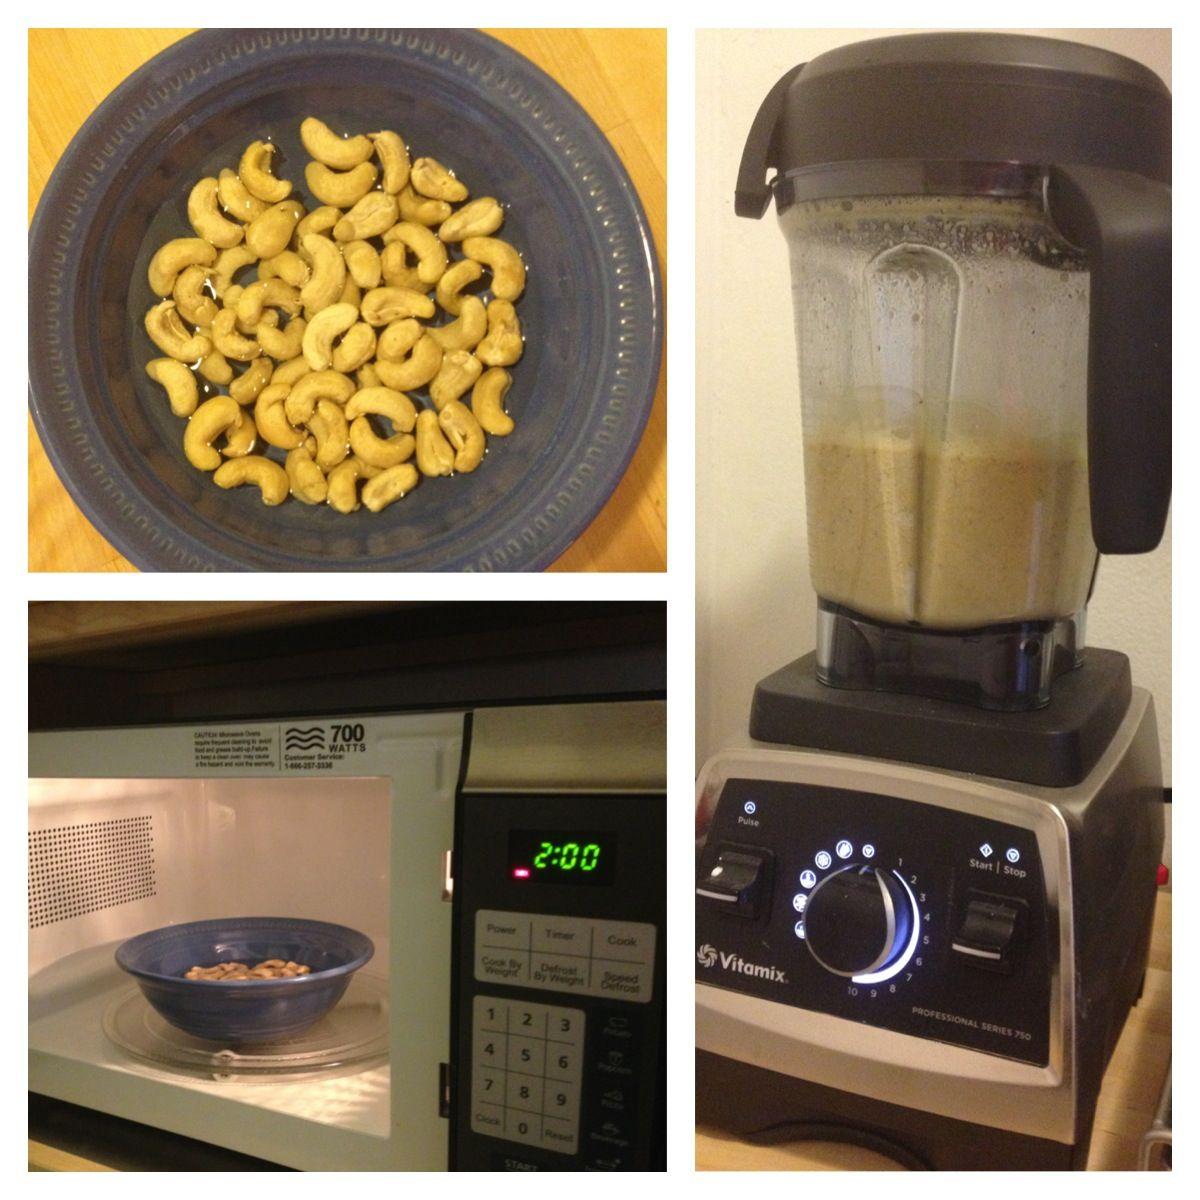 How To Make Vegan Alfredo Sauce Hint The Secret Ingredient Is Cashews Vegan Recipes Best Vegan Recipes Recipes